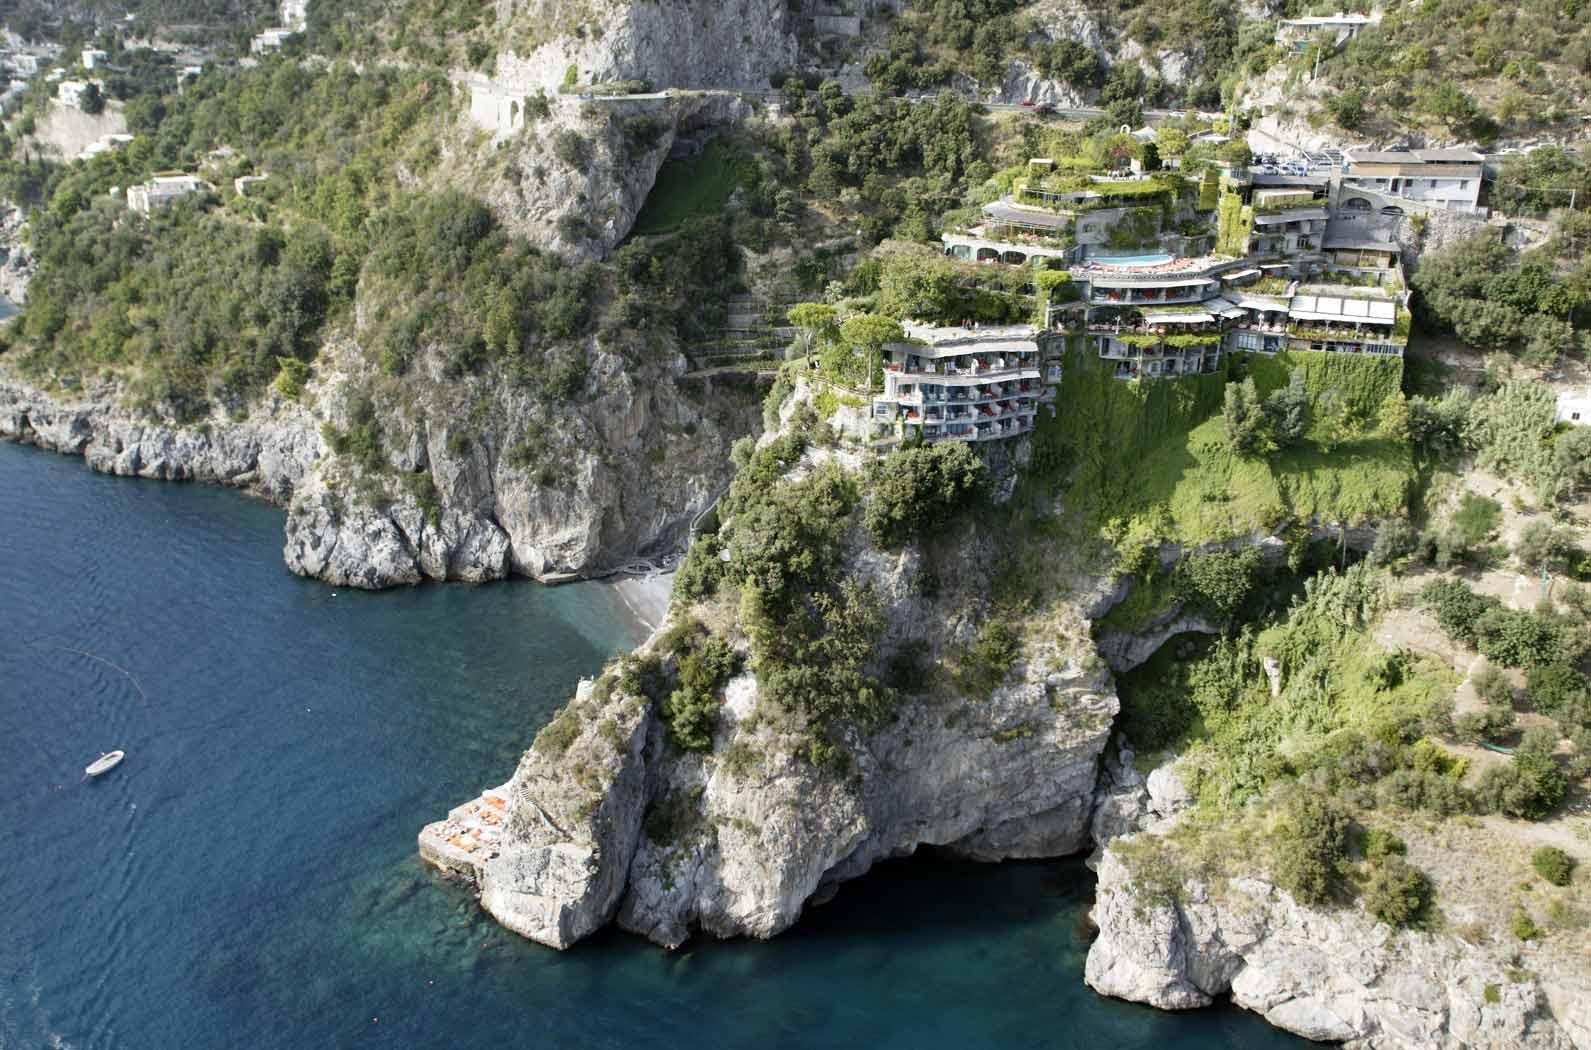 Hotel San Pietro Costiera Amalfitana